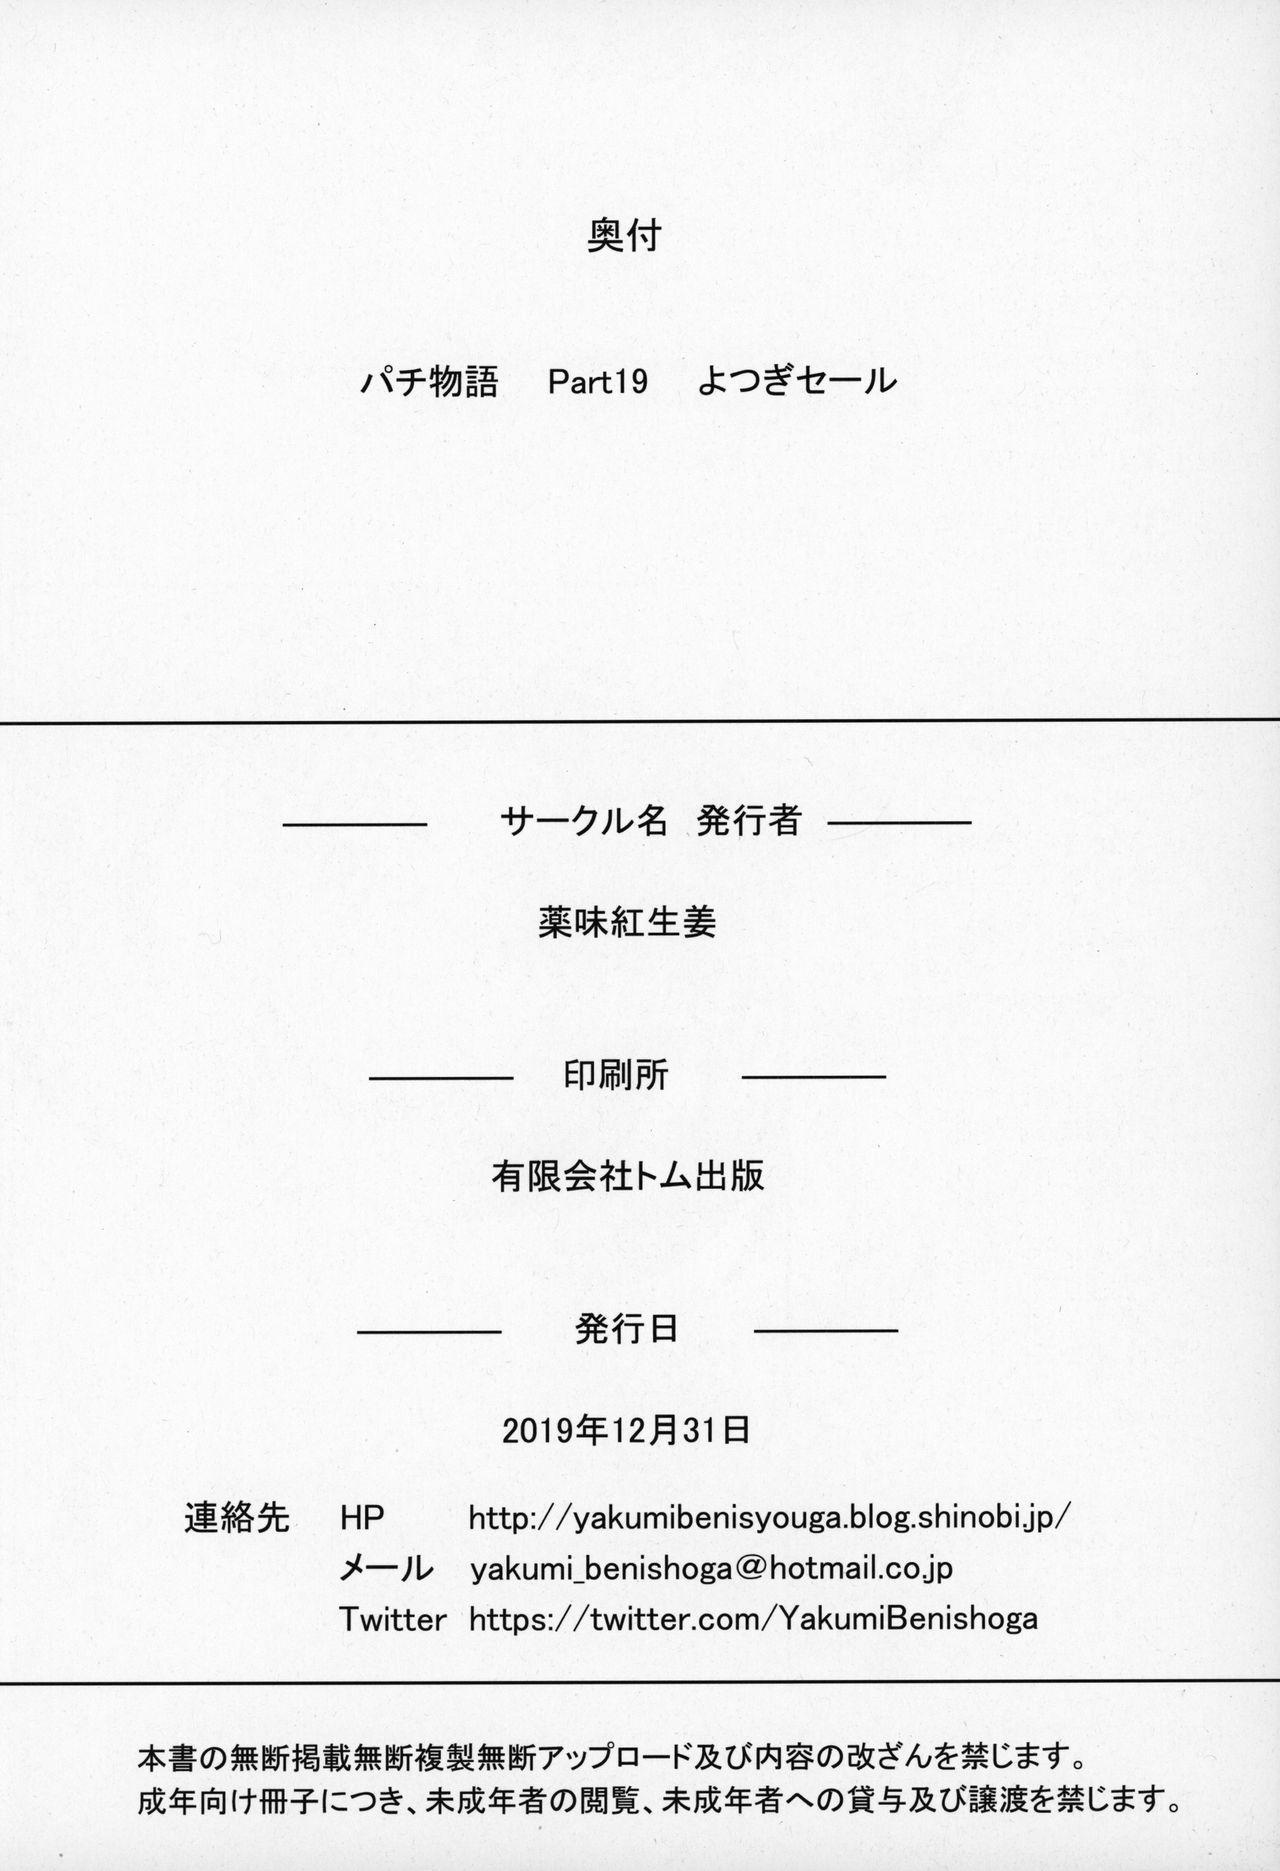 Pachimonogatari Part 19: Yotsugi Sale 25